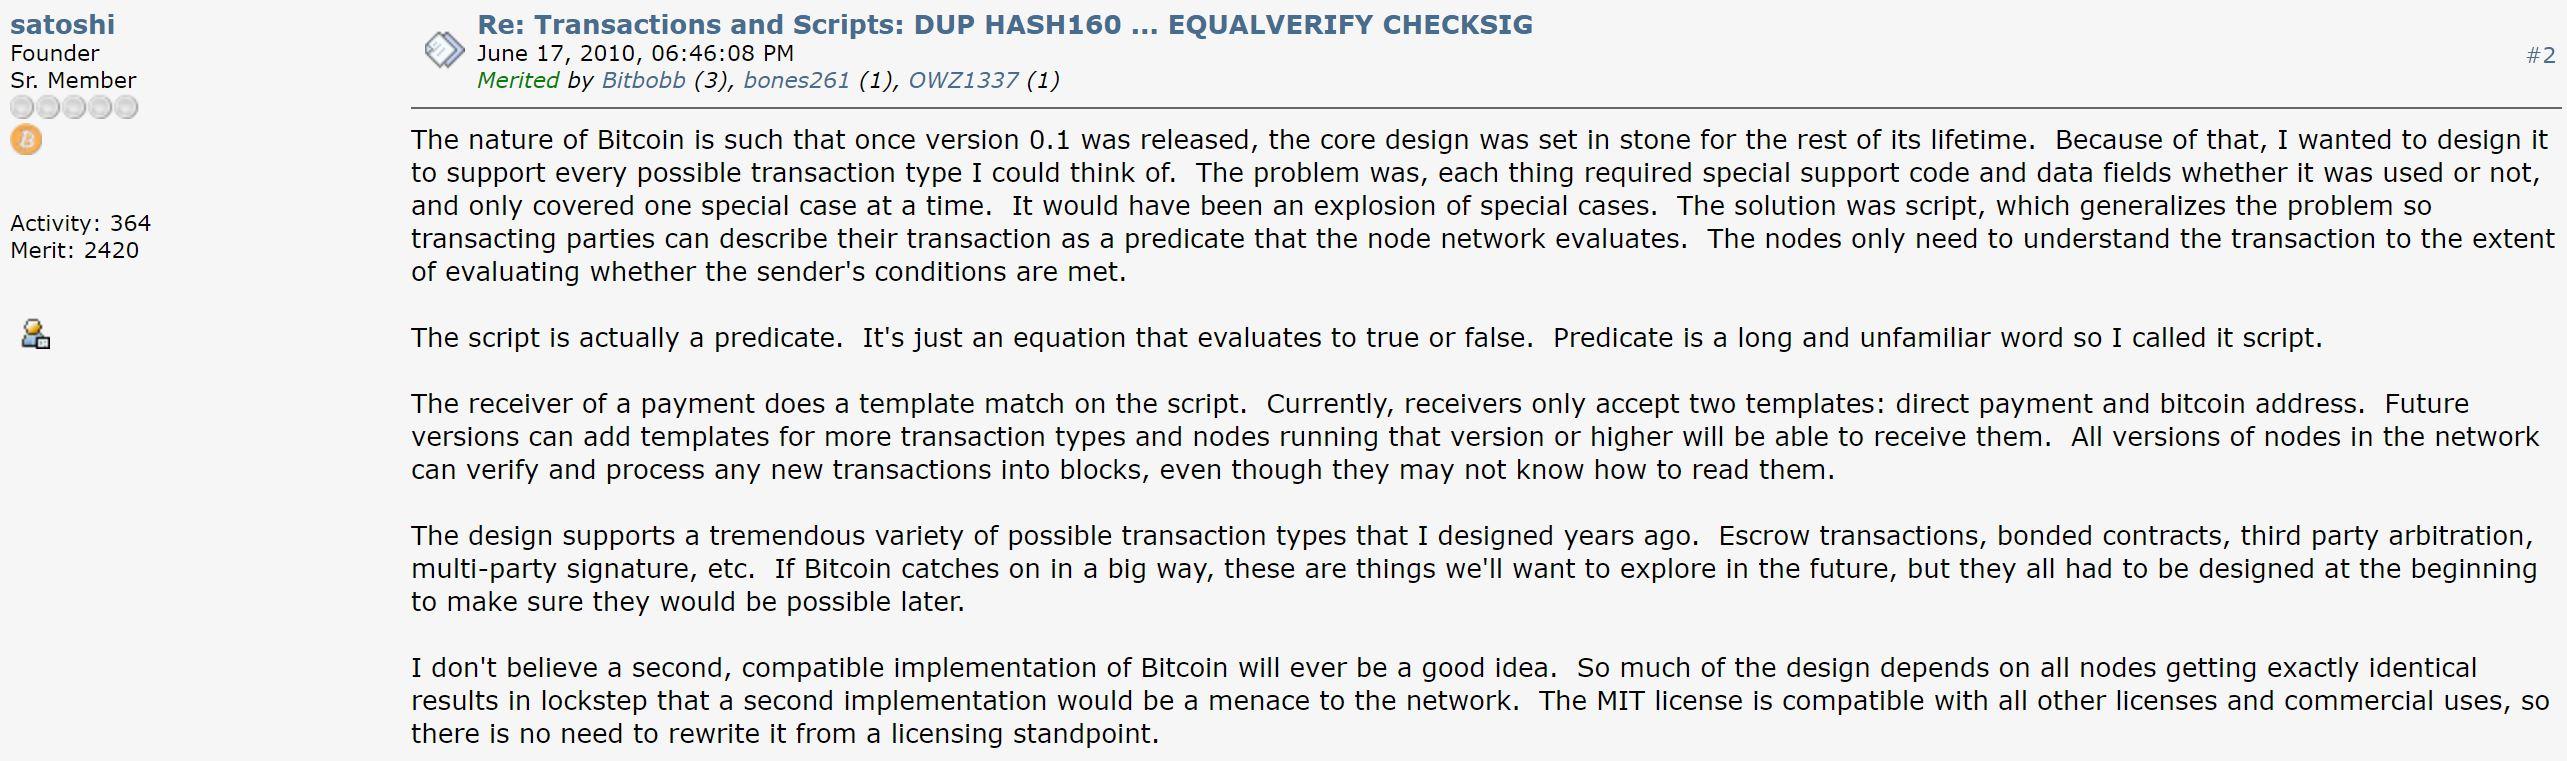 Satoshi Bitcoin talk trusted 3rd party.JPG